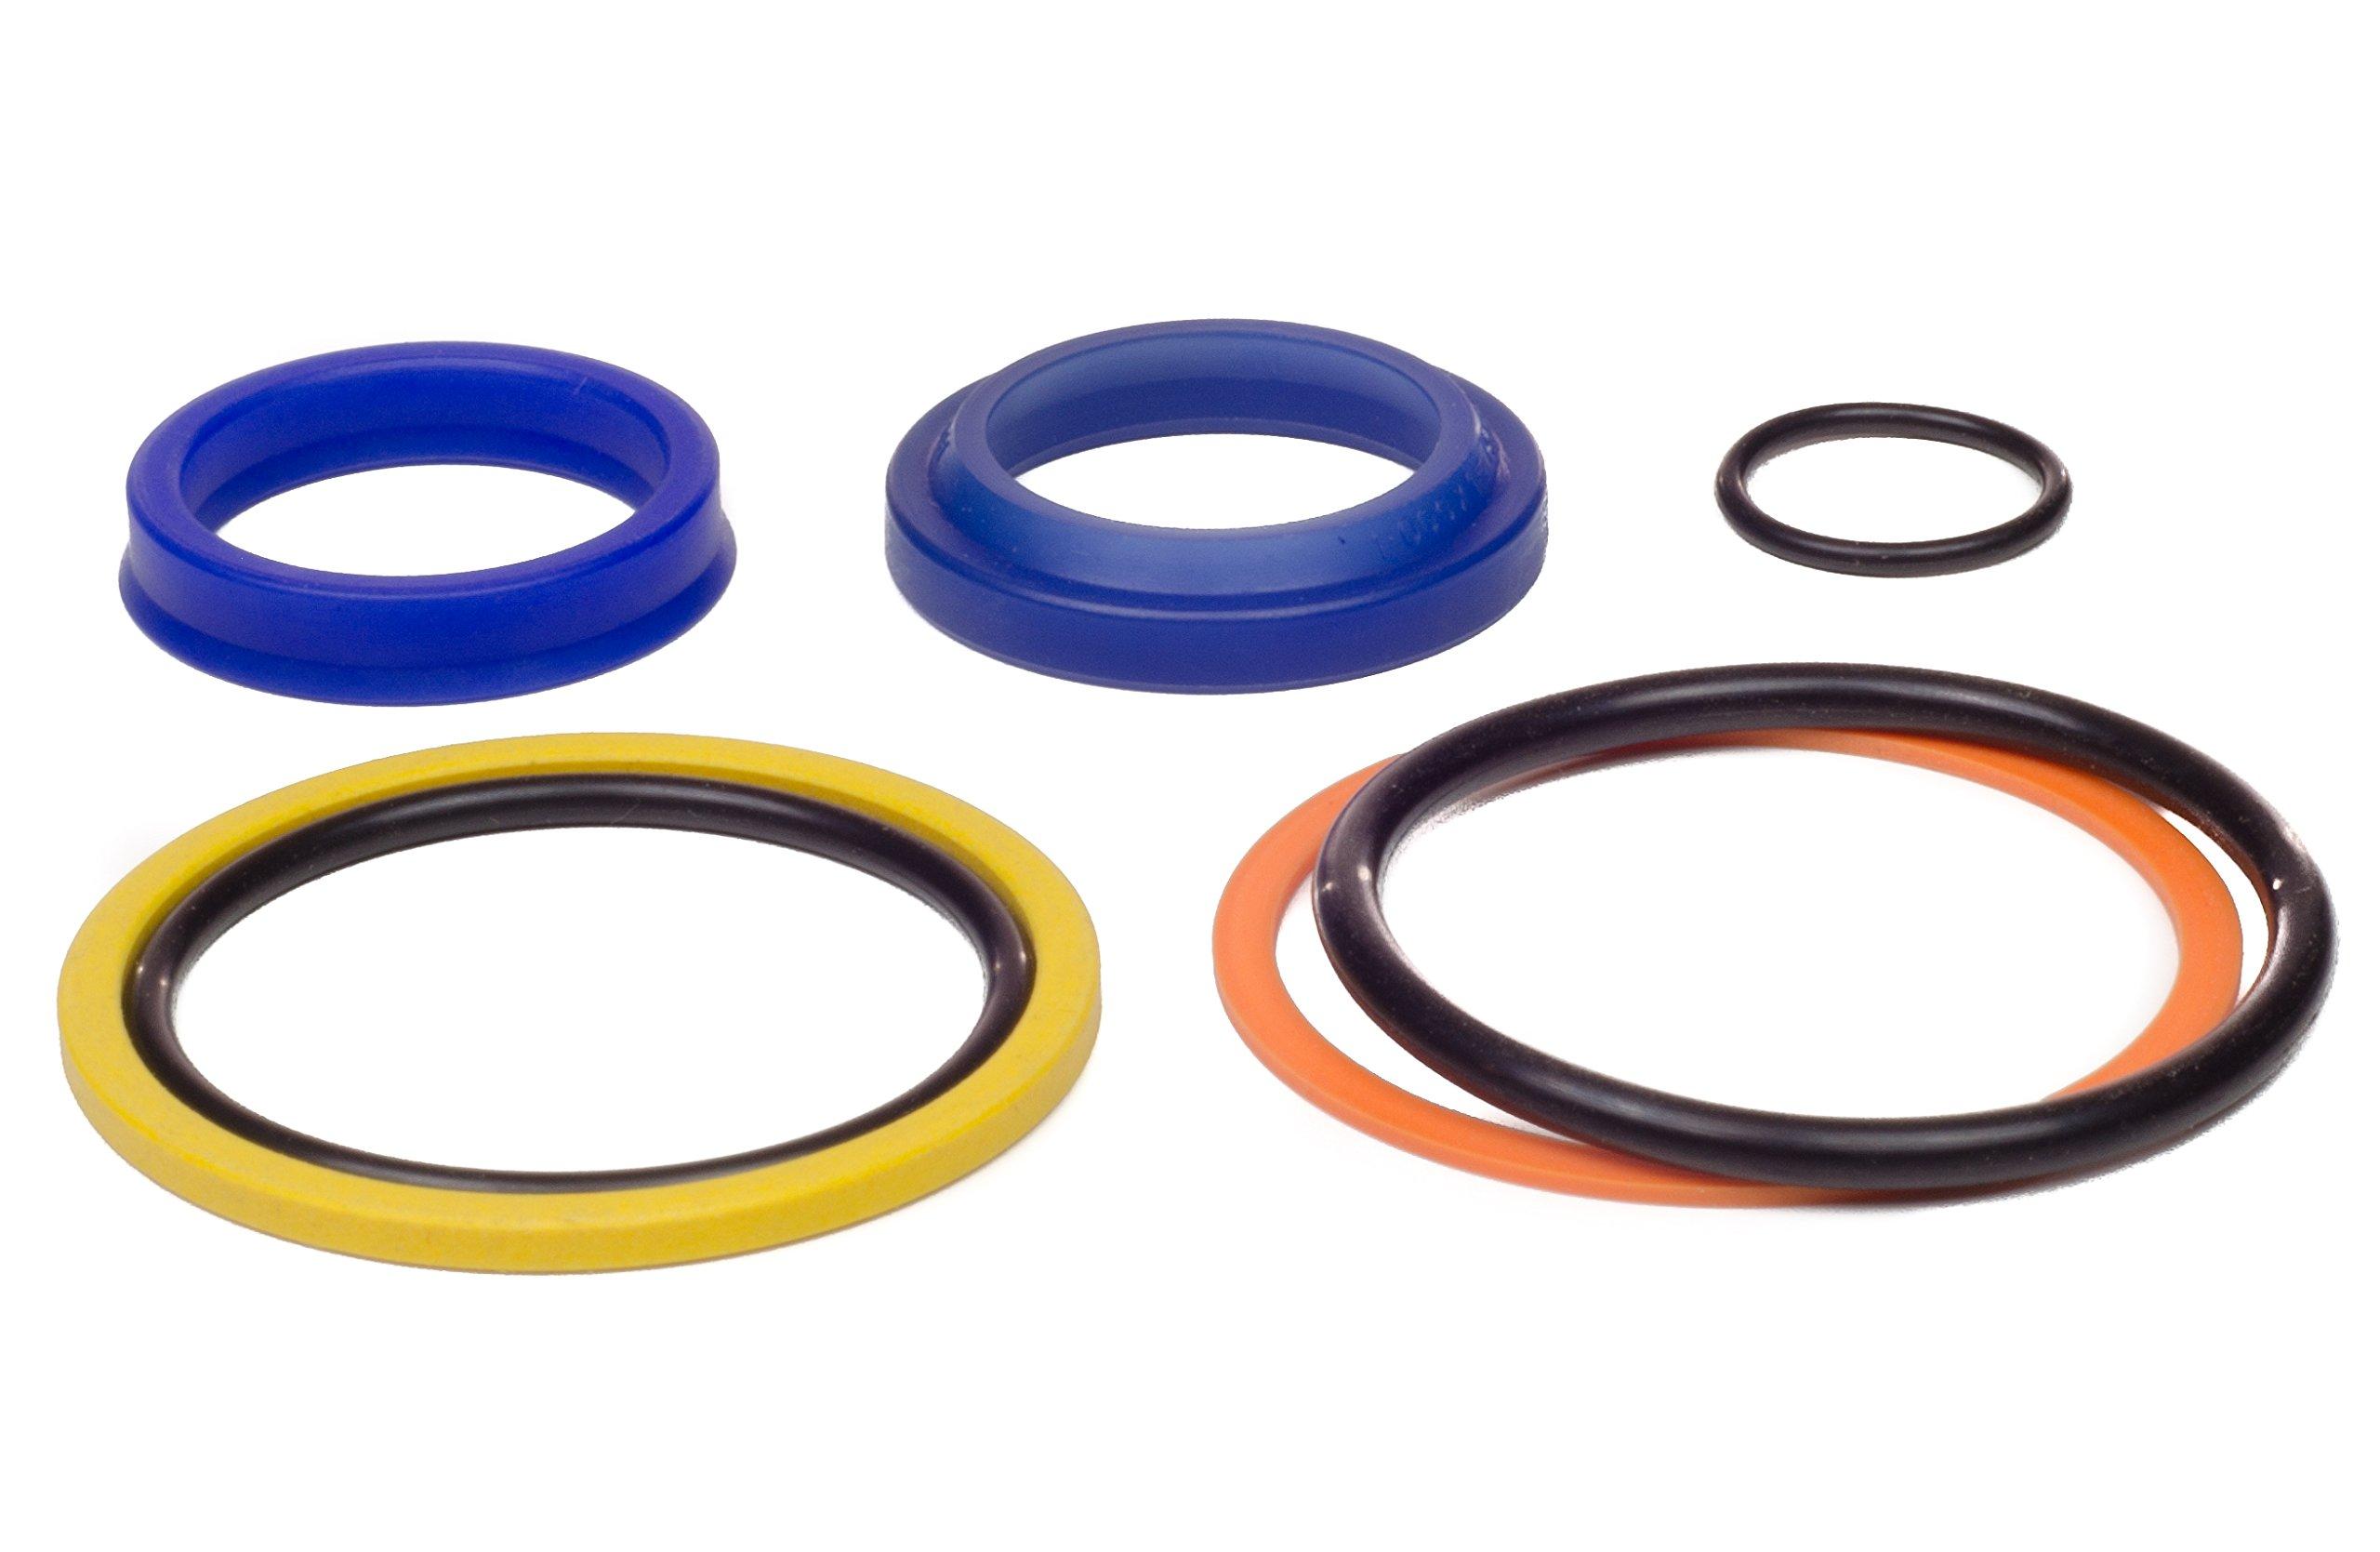 Bobcat 6504960 Aftermarket Hydraulic Cylinder Seal Kit by Kit King USA